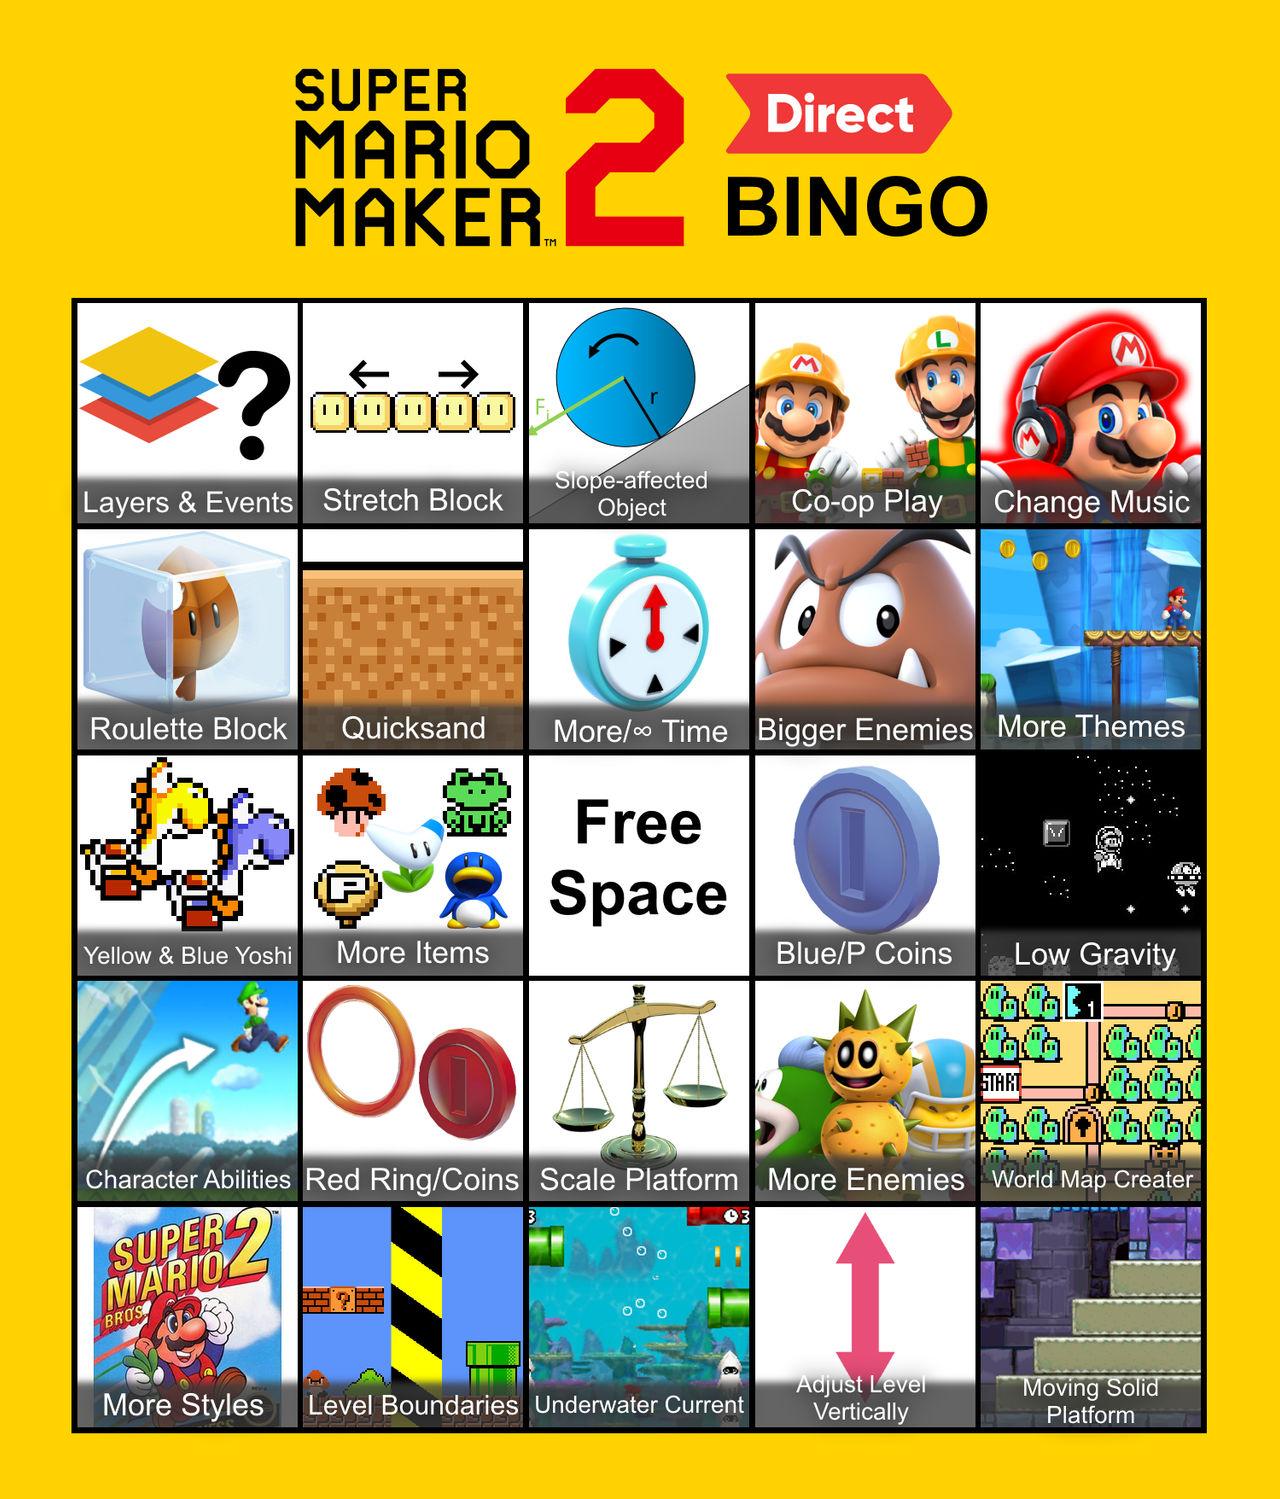 Super Mario Maker 2 Direct Bingo Card by MysteriousGalaxy64